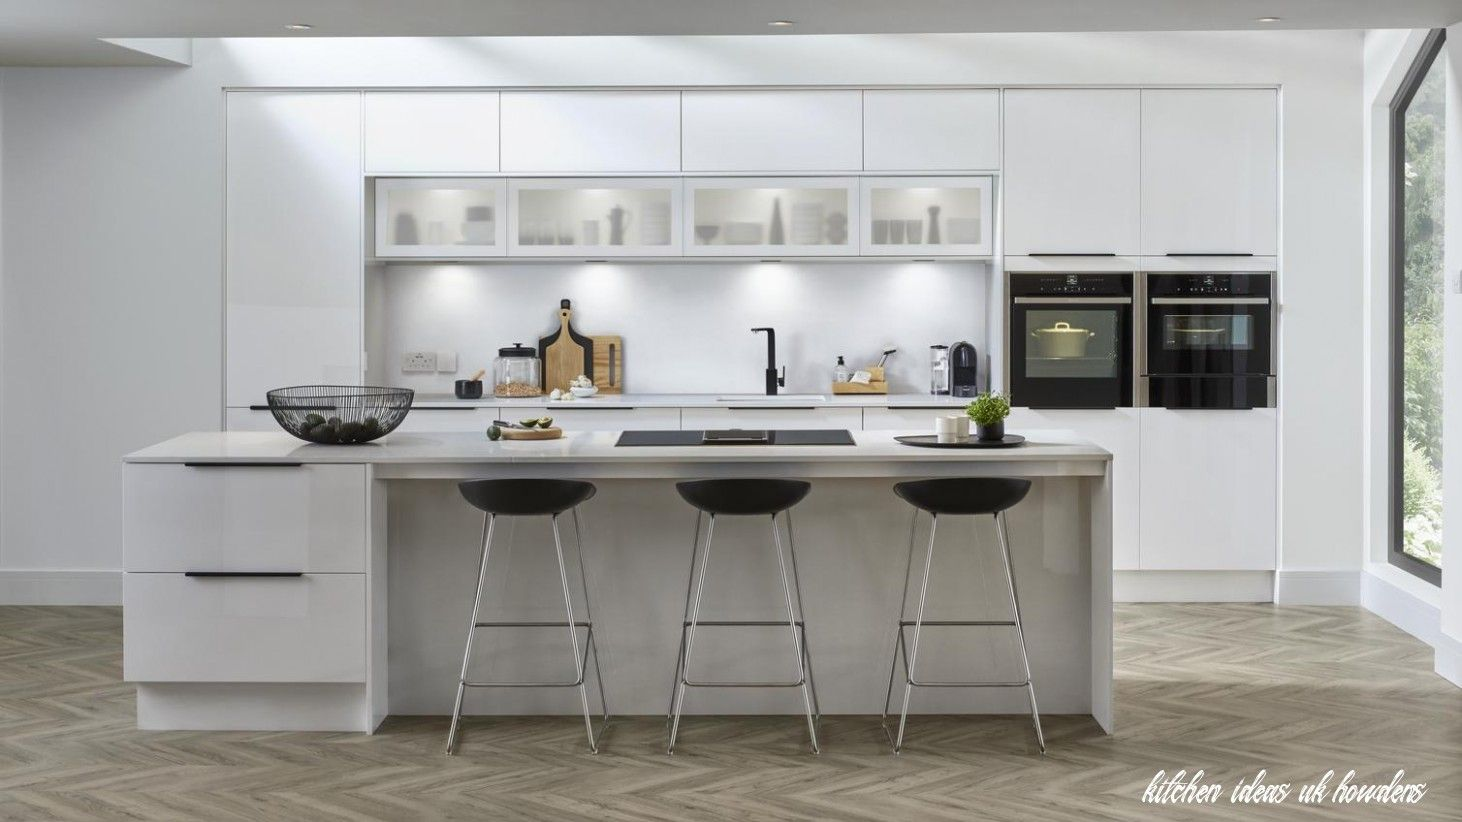 8 Kitchen Ideas Uk Howdens in 2020 Howdens kitchens